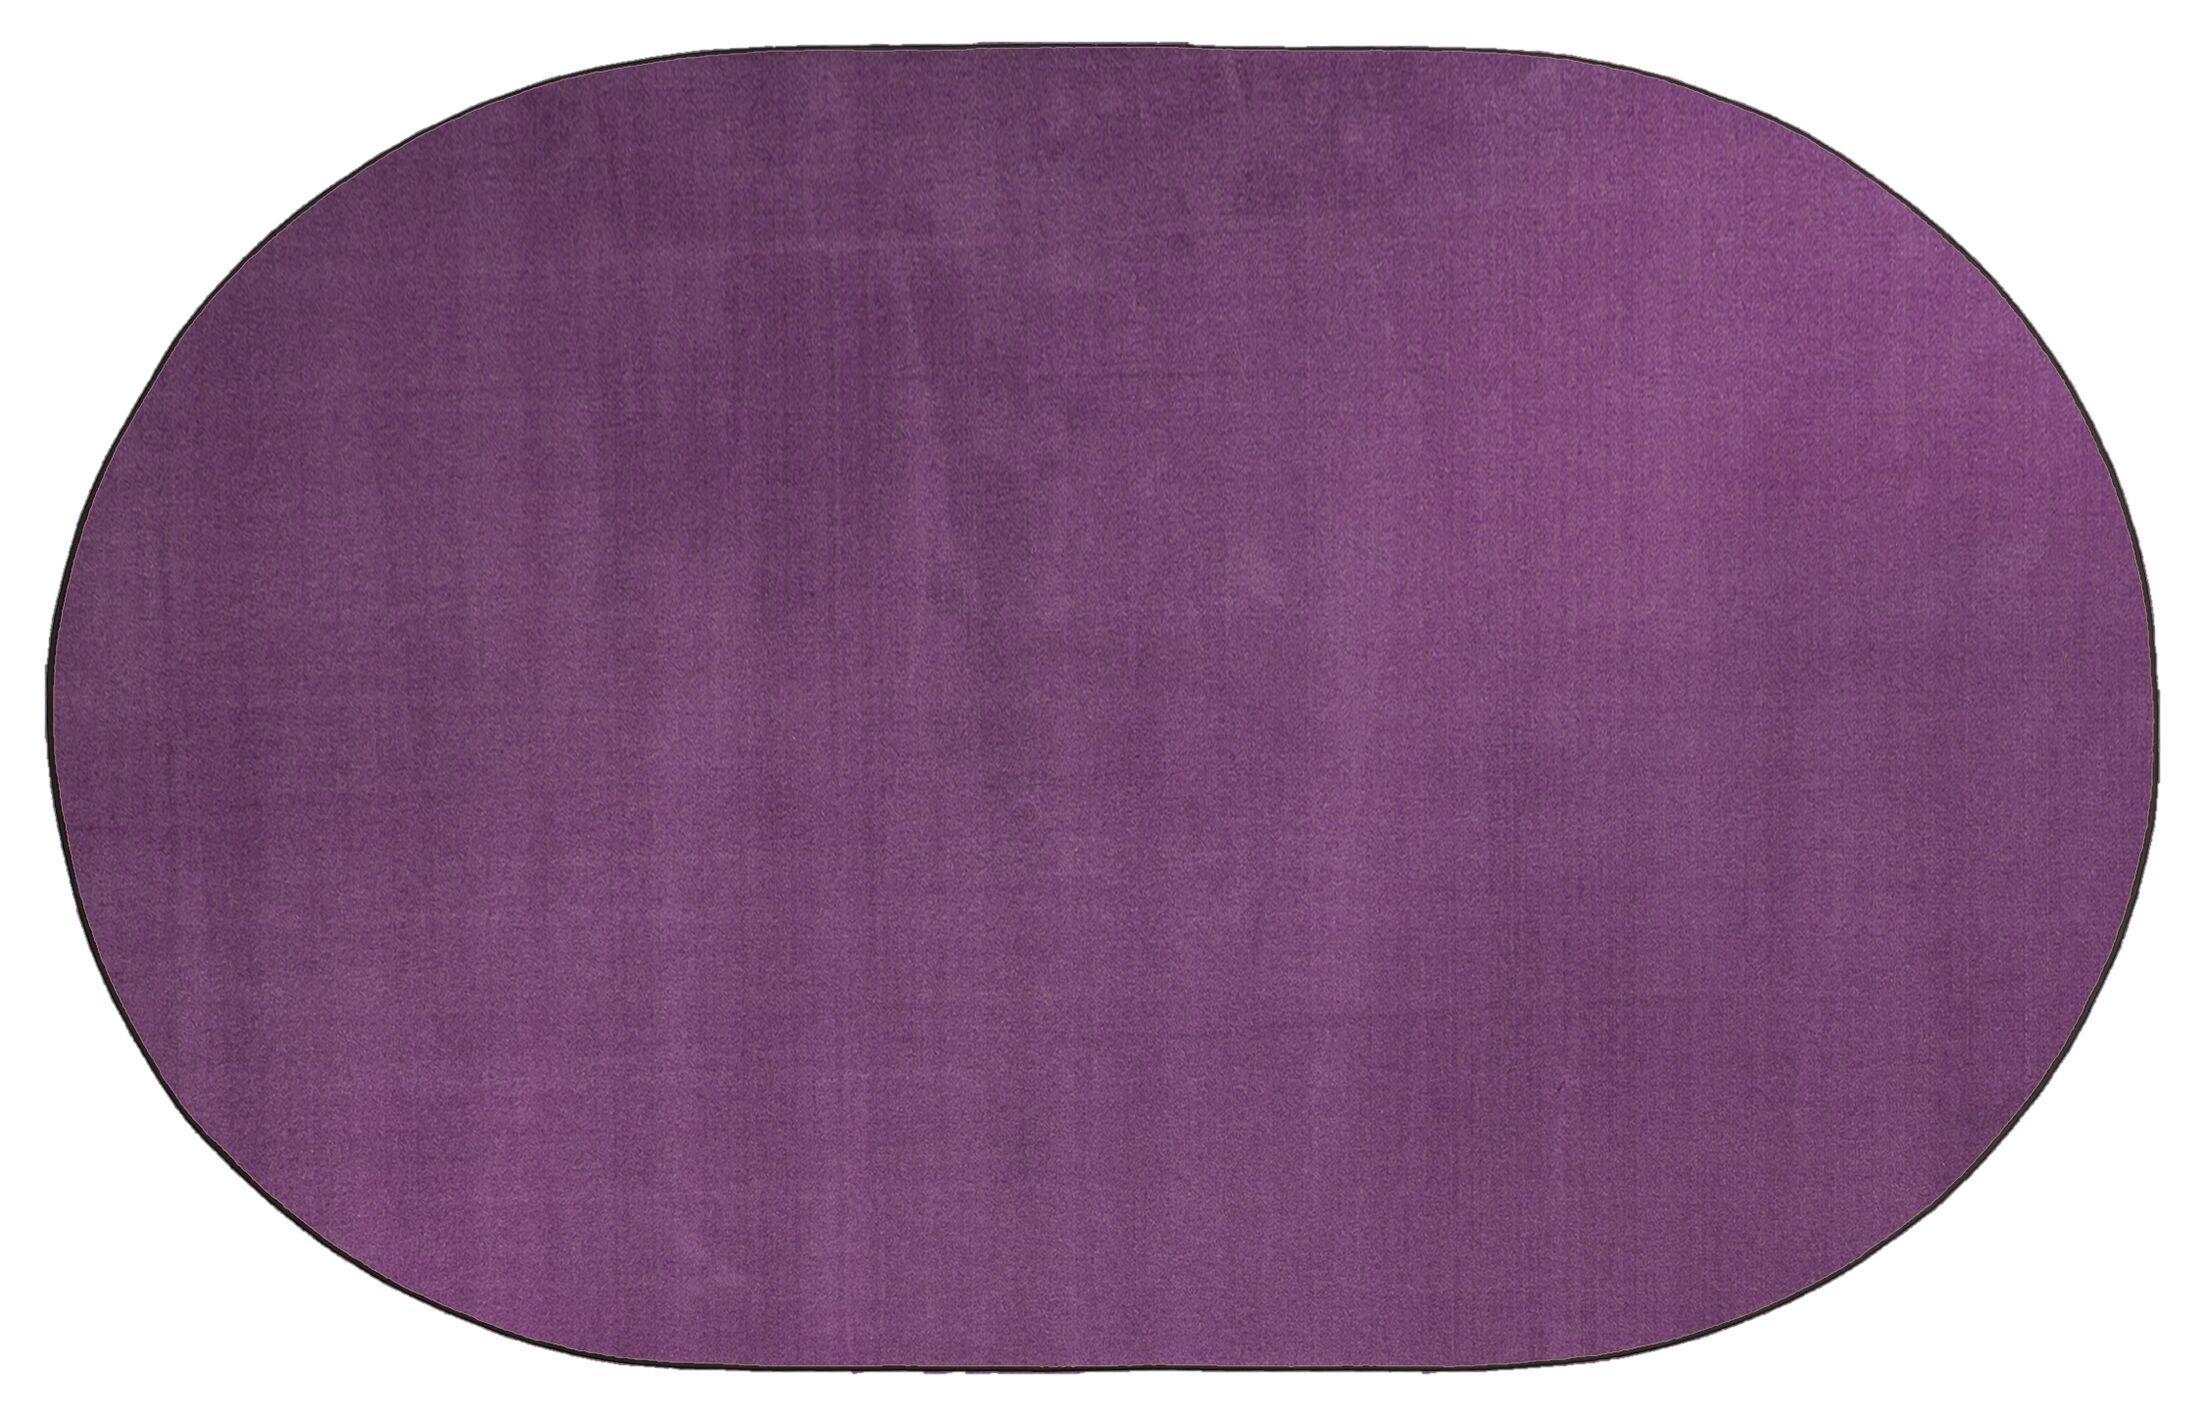 Americolors Pretty Purple Area Rug Rug Size: Oval 7'6